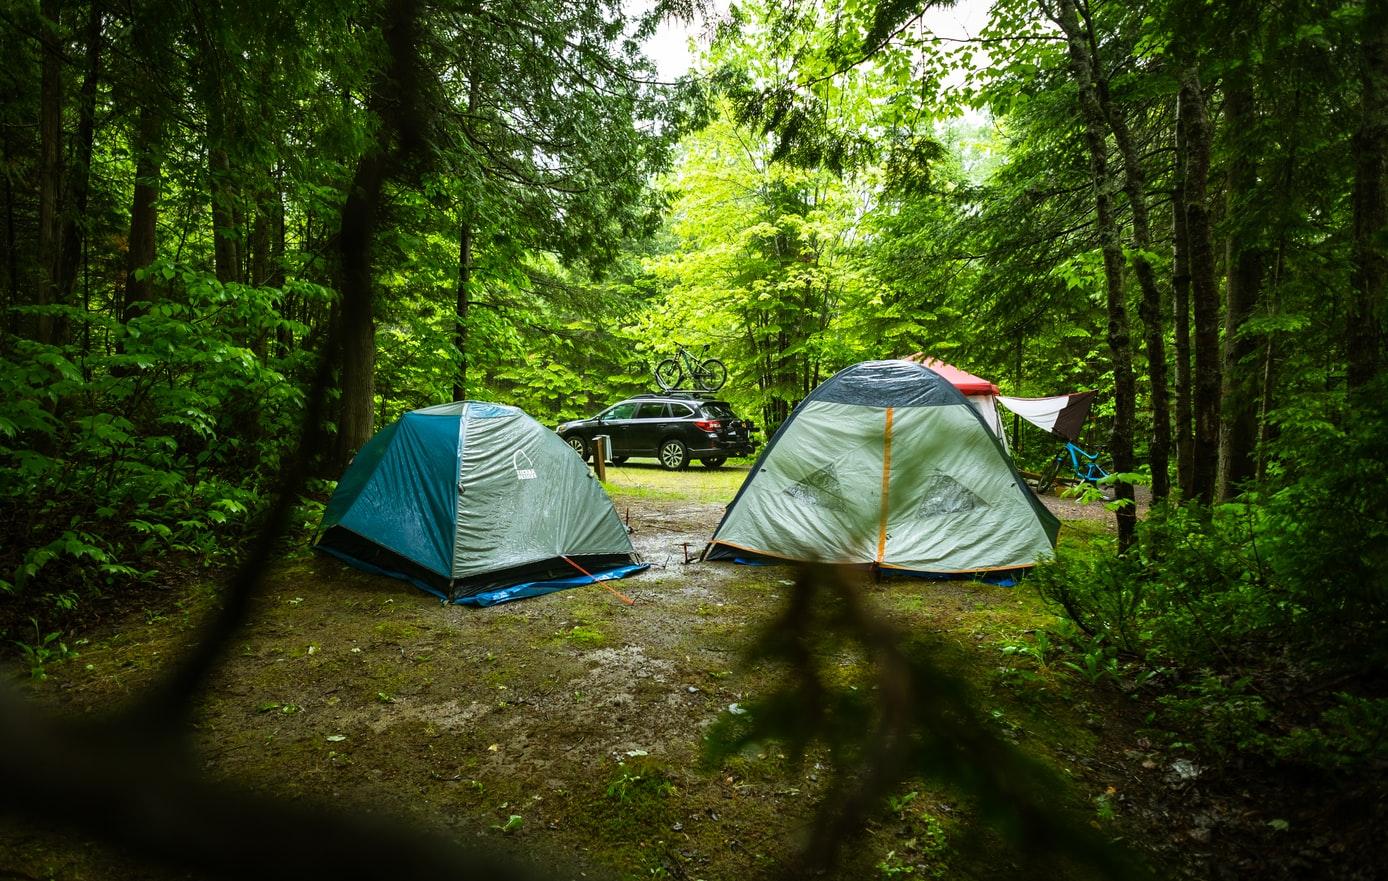 how to keep air mattress warm when camping